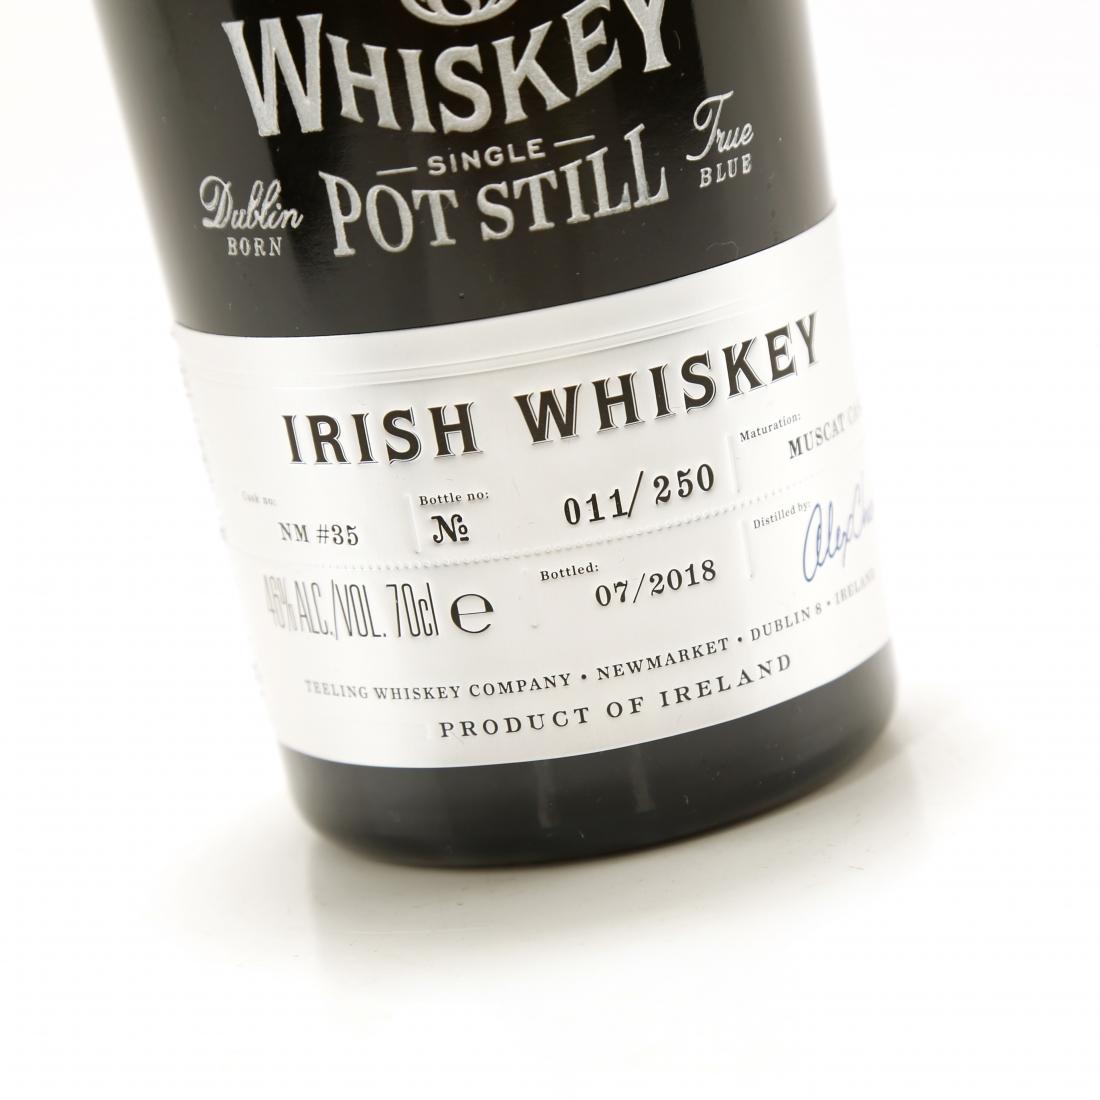 Teeling Celebratory Single Pot Still Whiskey / Bottle #011